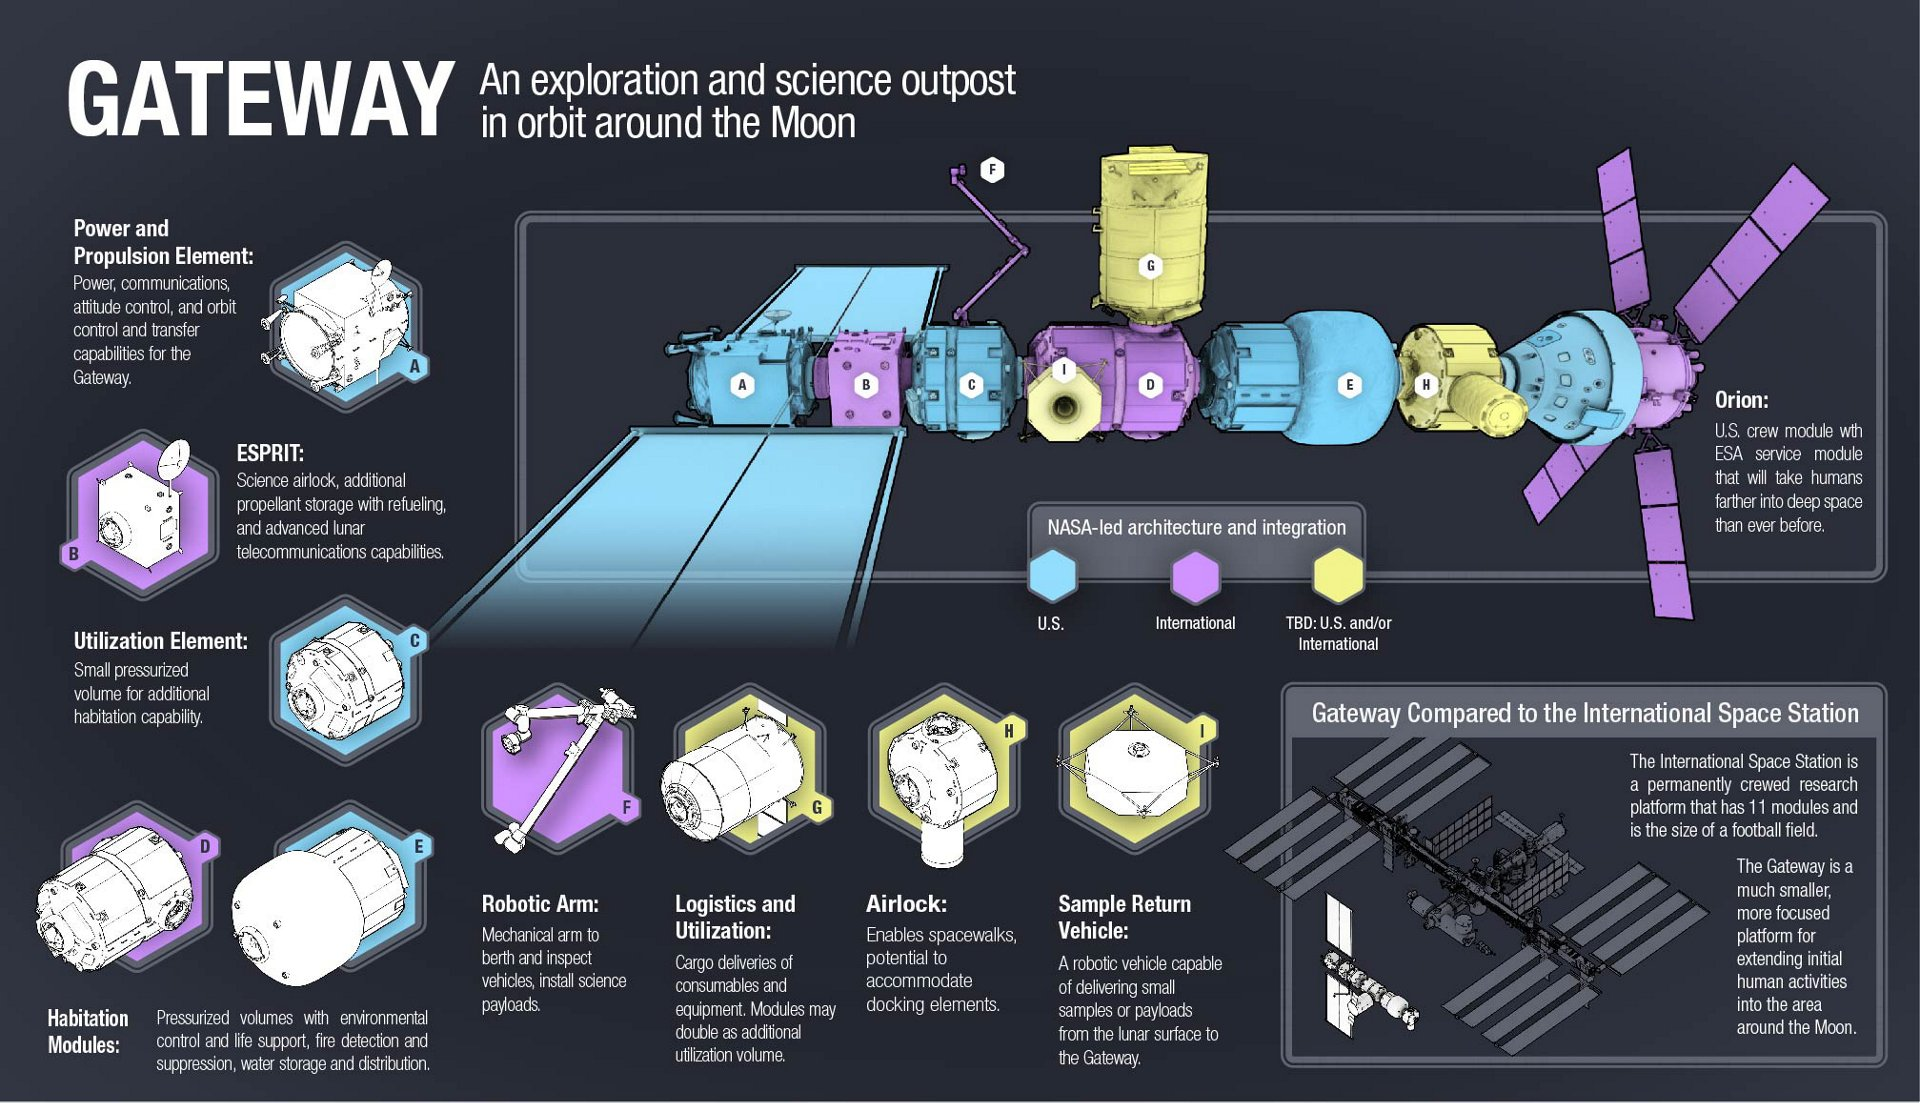 gateway-configuration-Credit-NASA.JPG